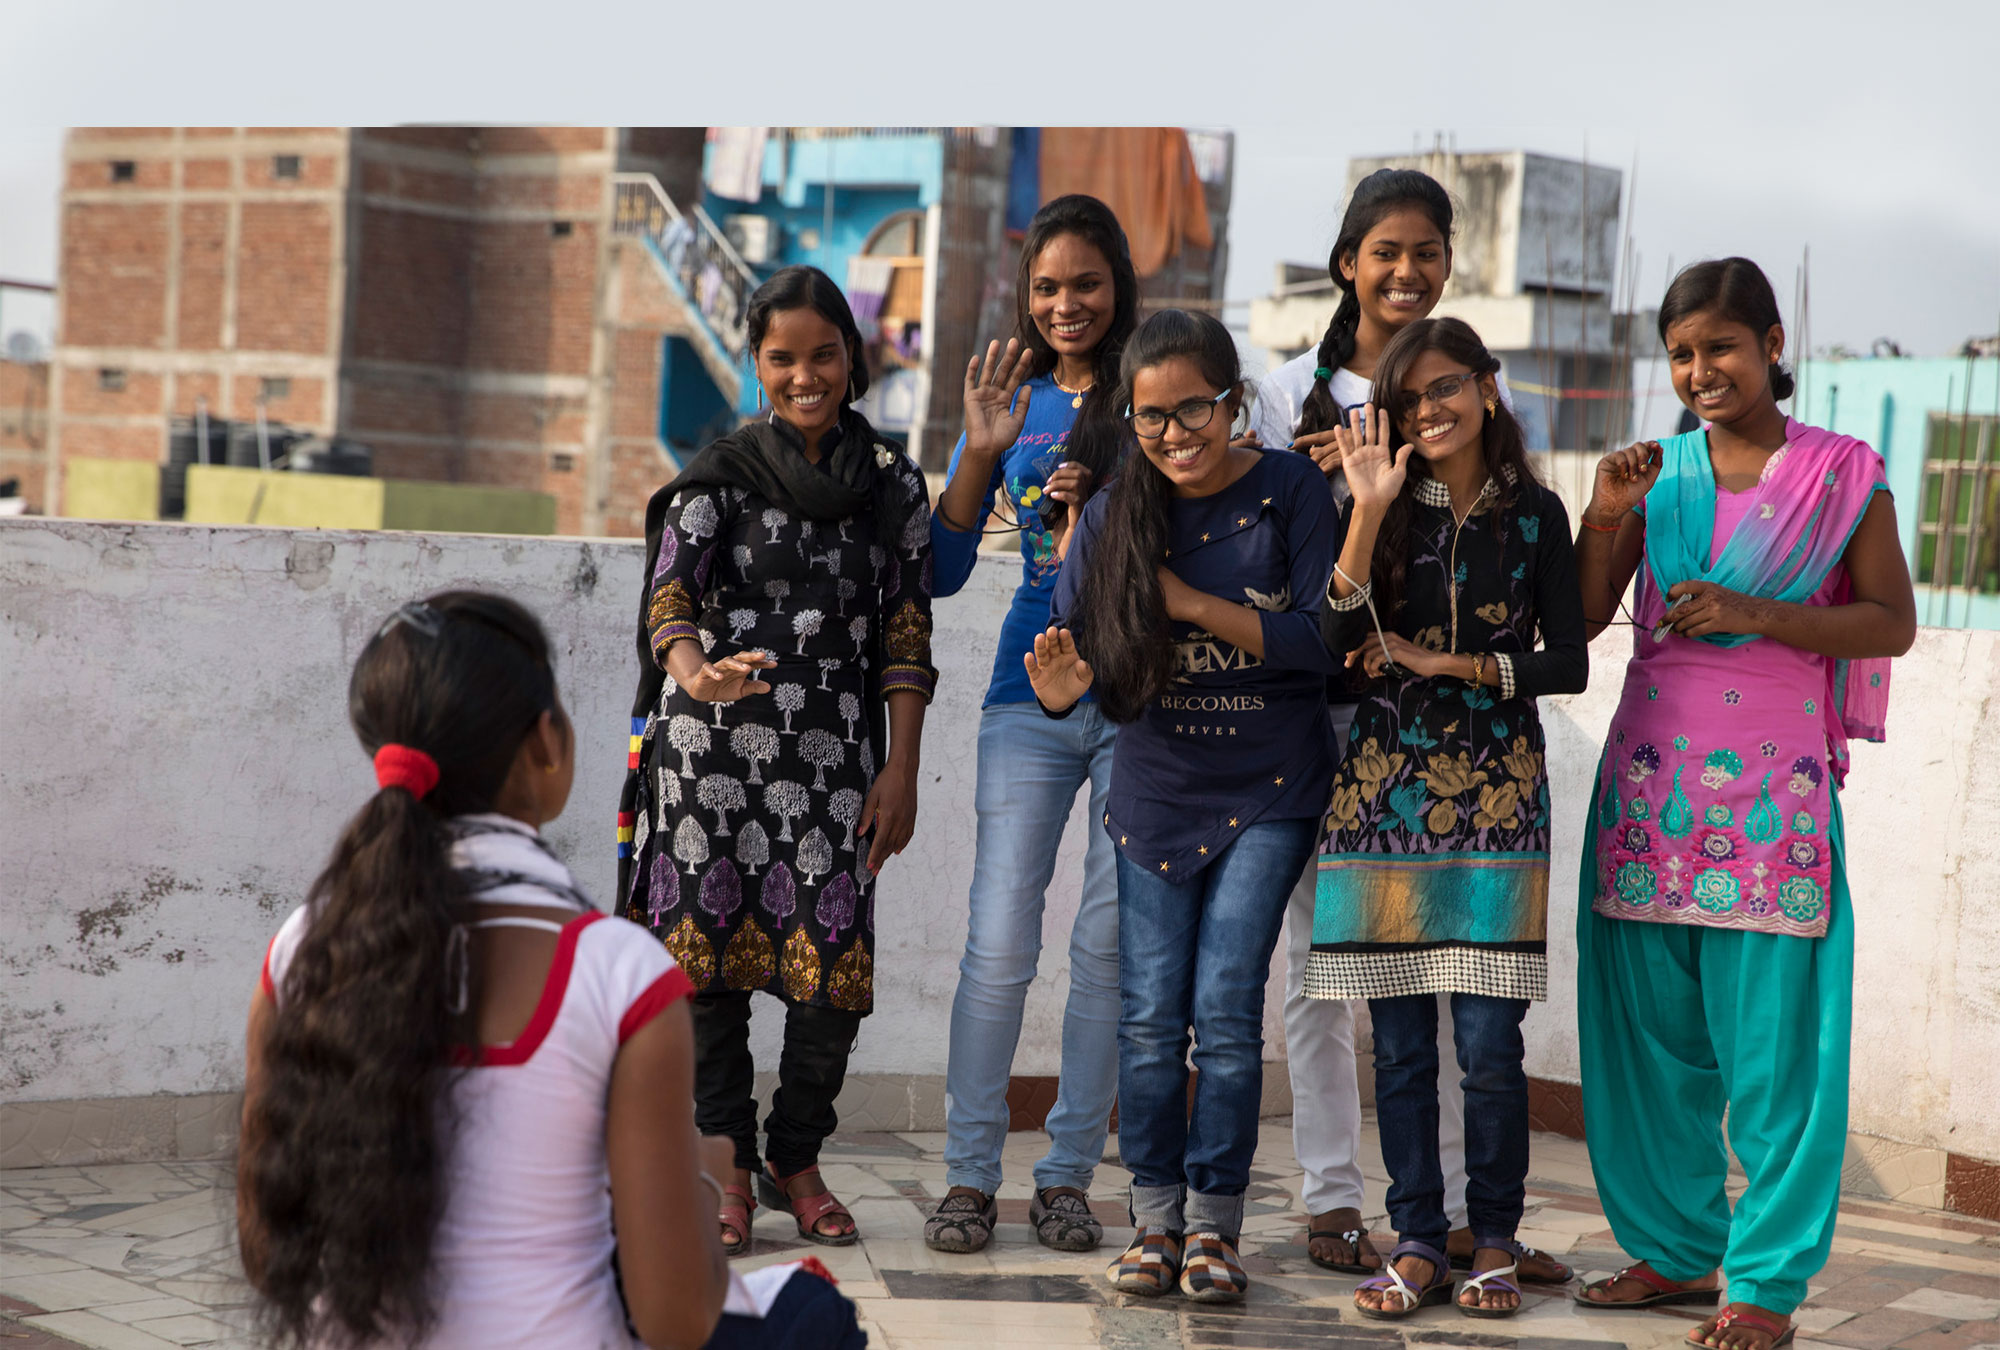 Young women take a group photo